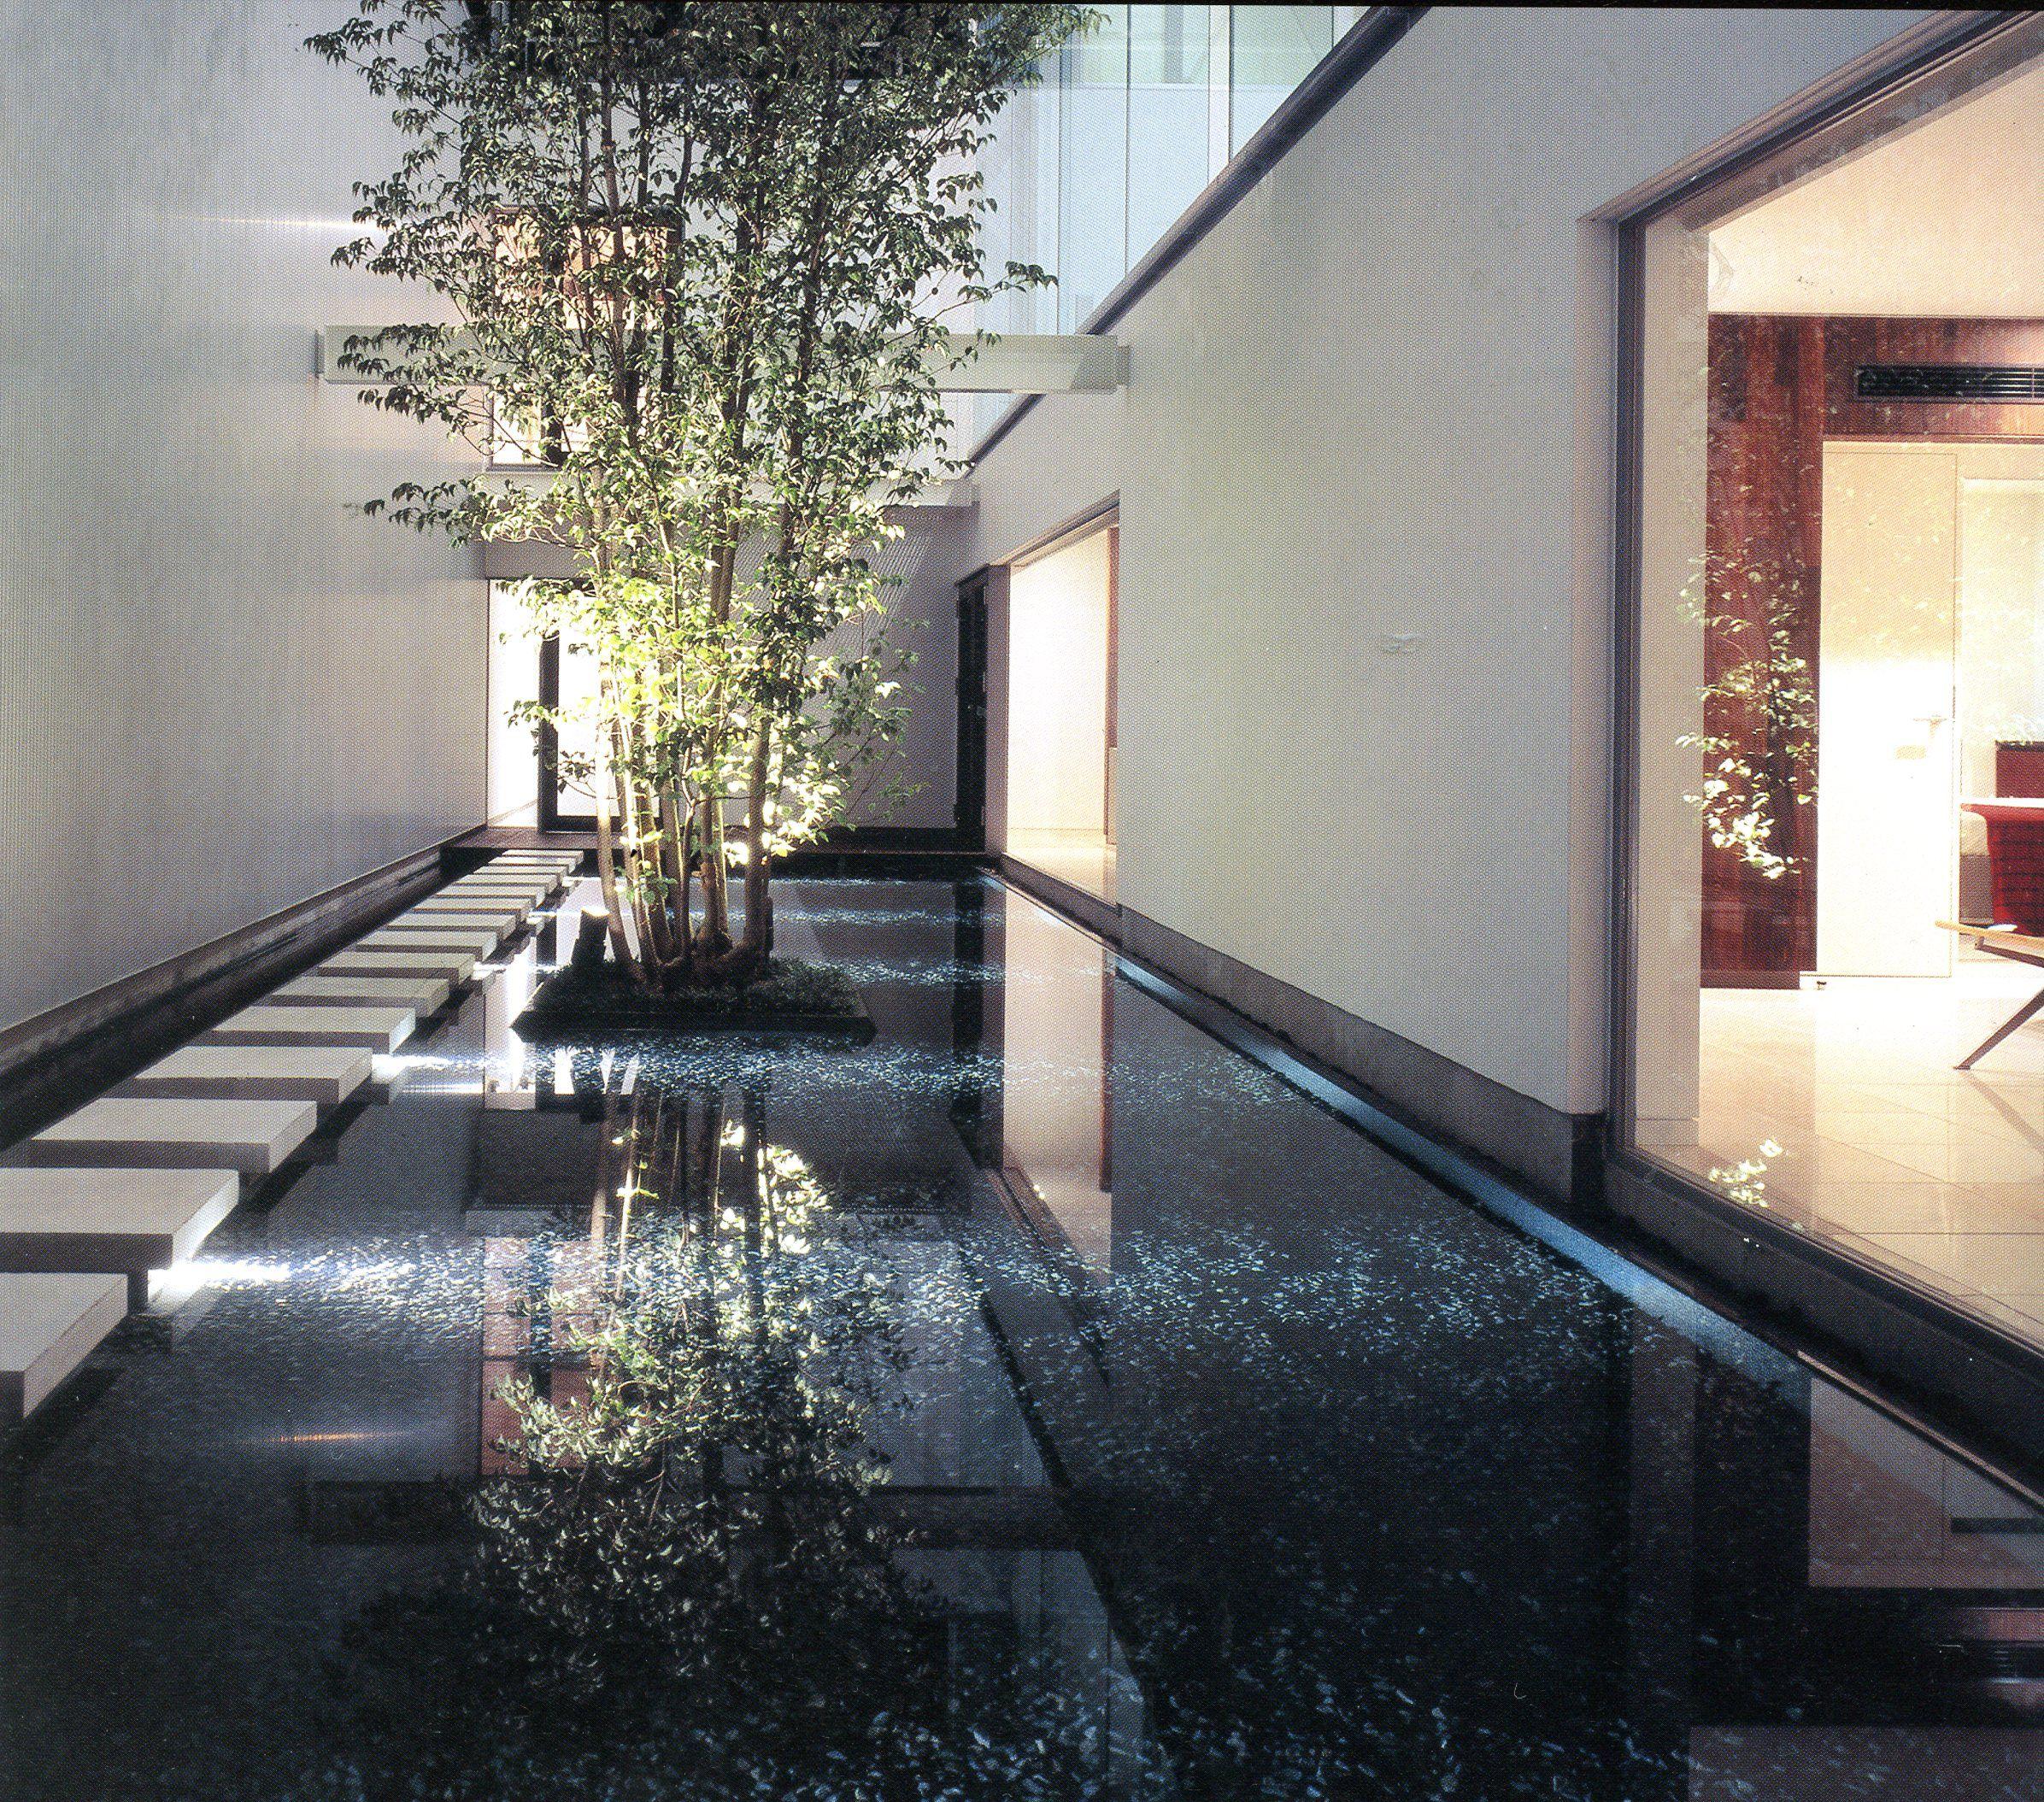 architect kishi warou the new zen garden designing quiet spaces